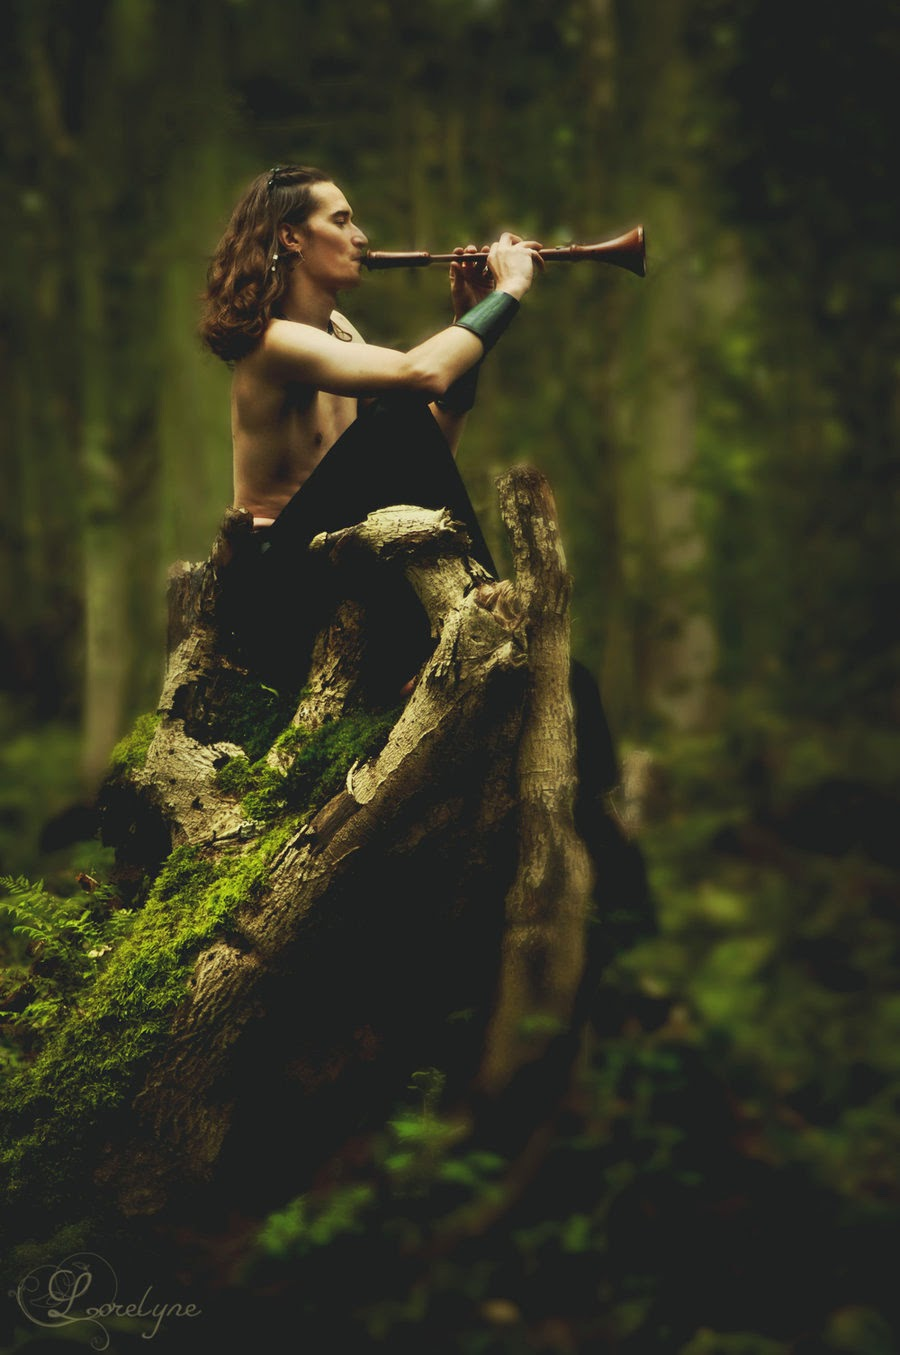 cosplay masculin de pan dans la forêt